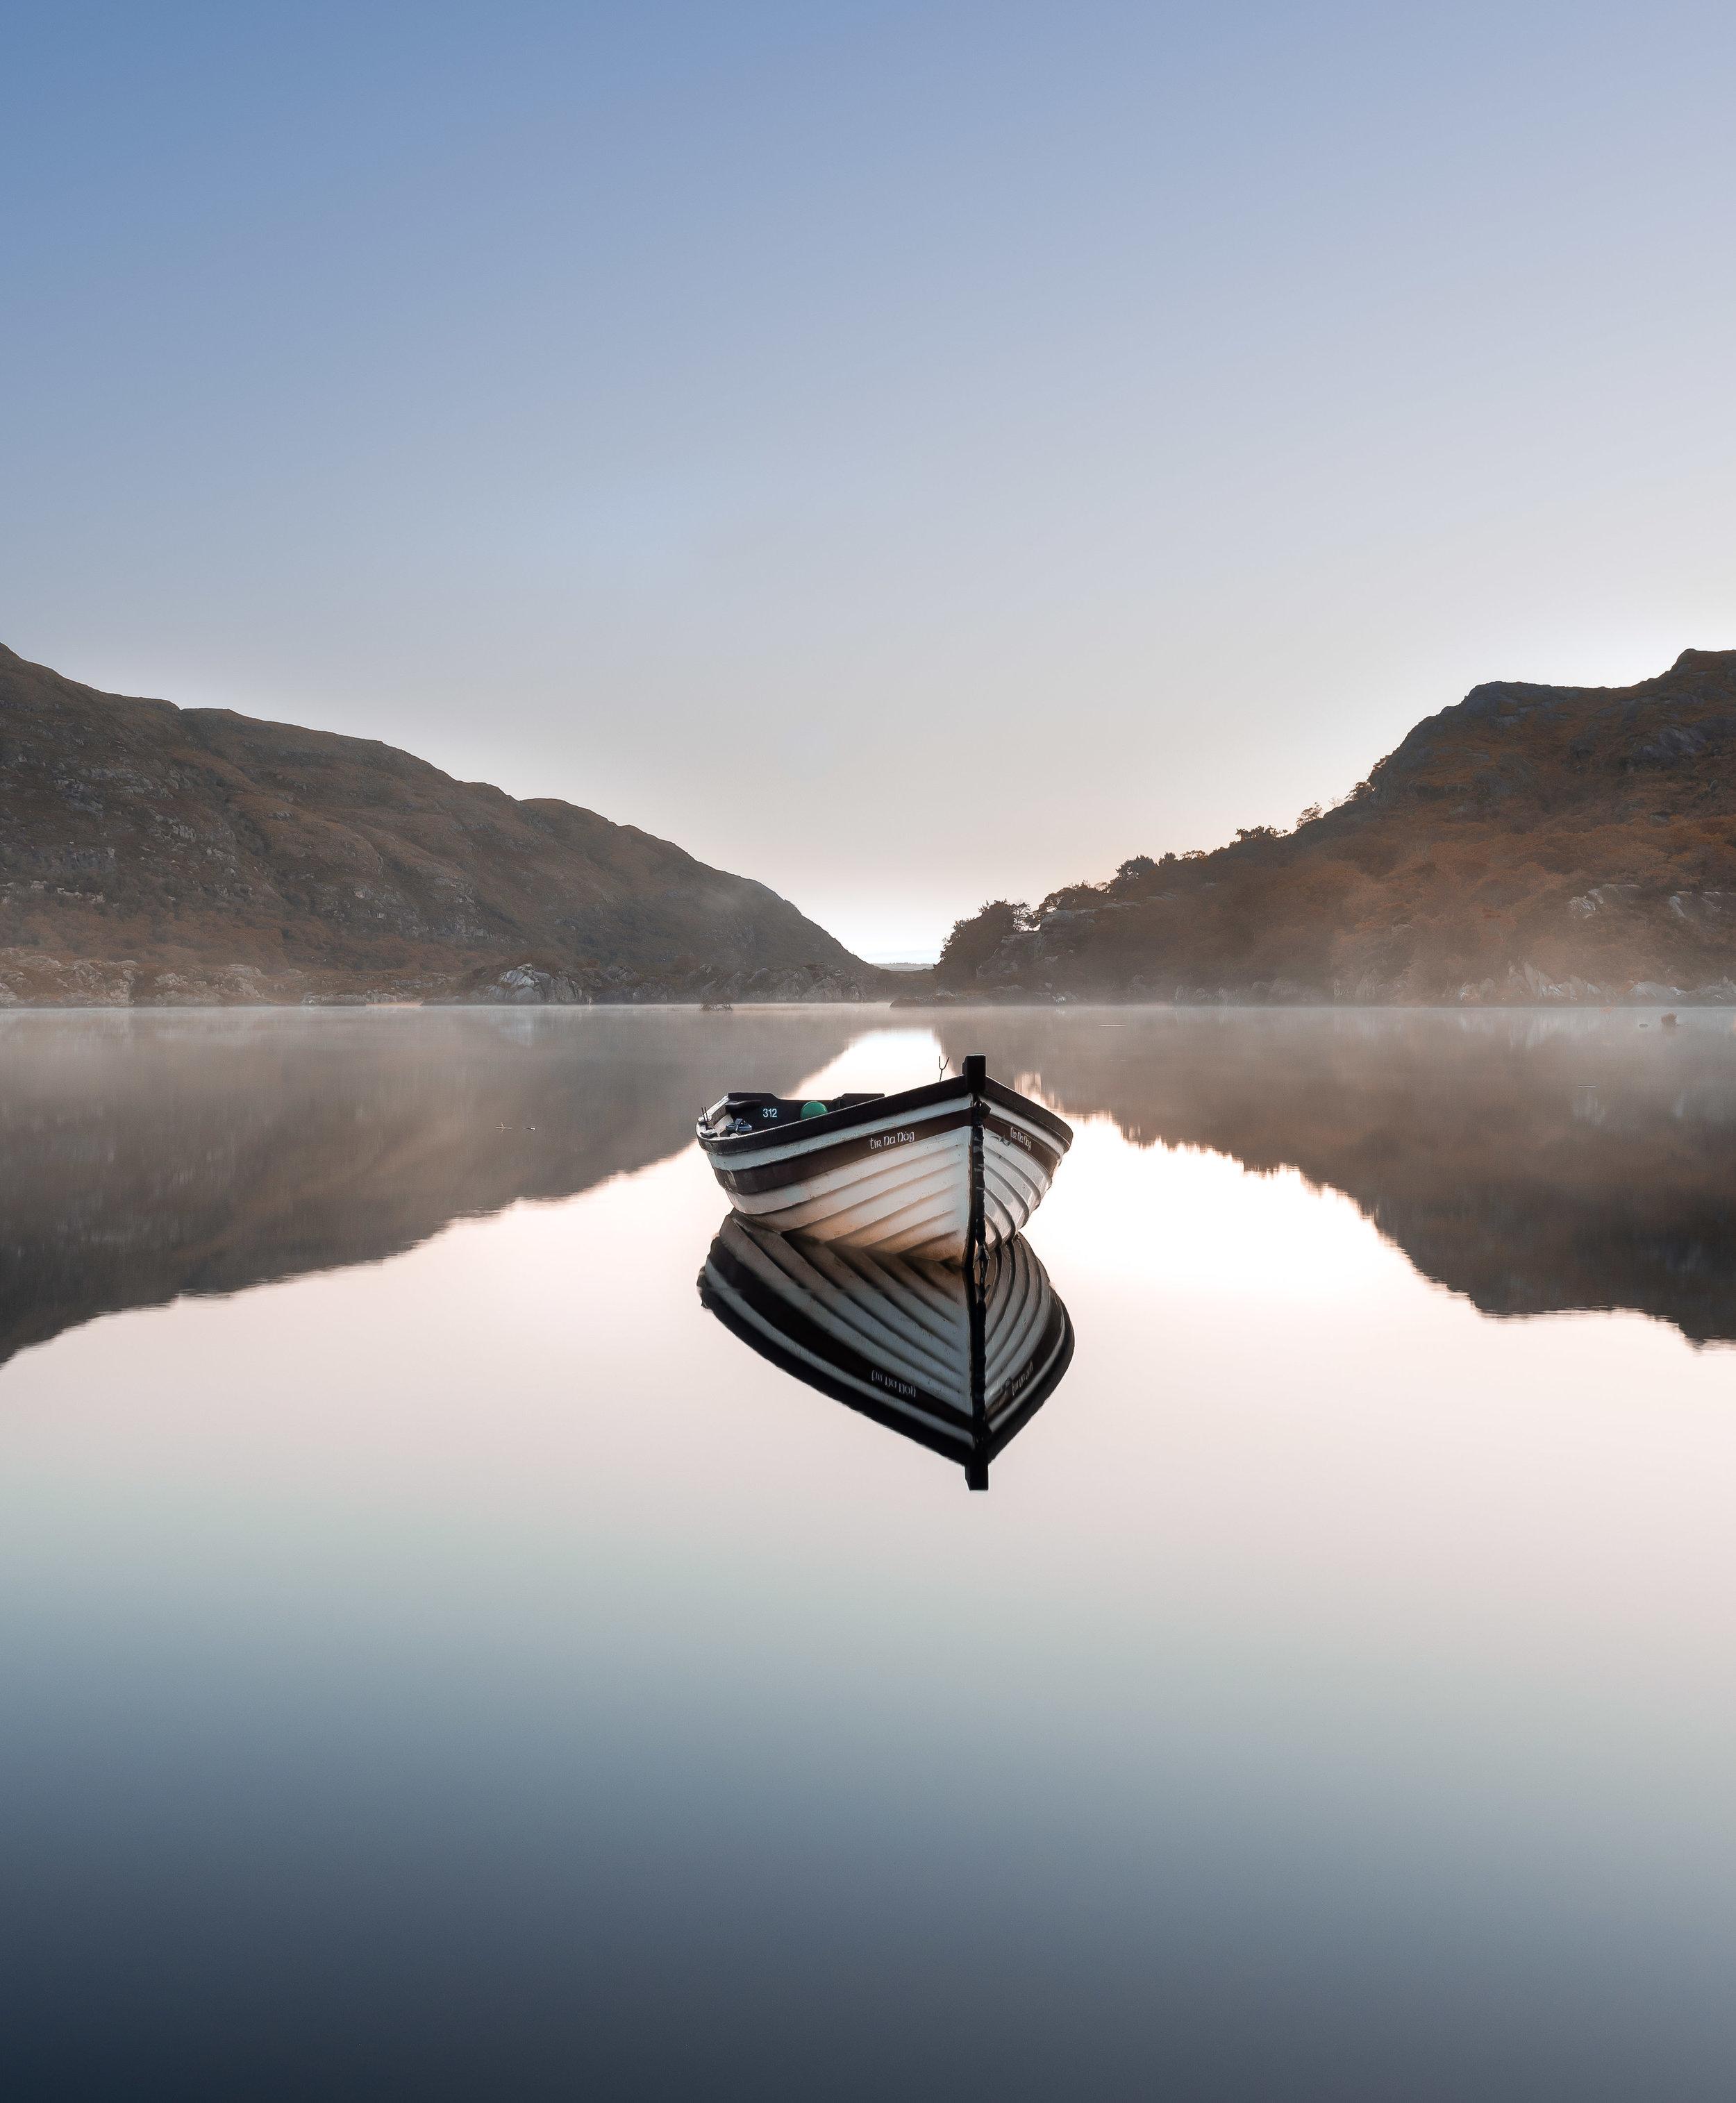 Pin sharp reflections on Killarneys upper lake